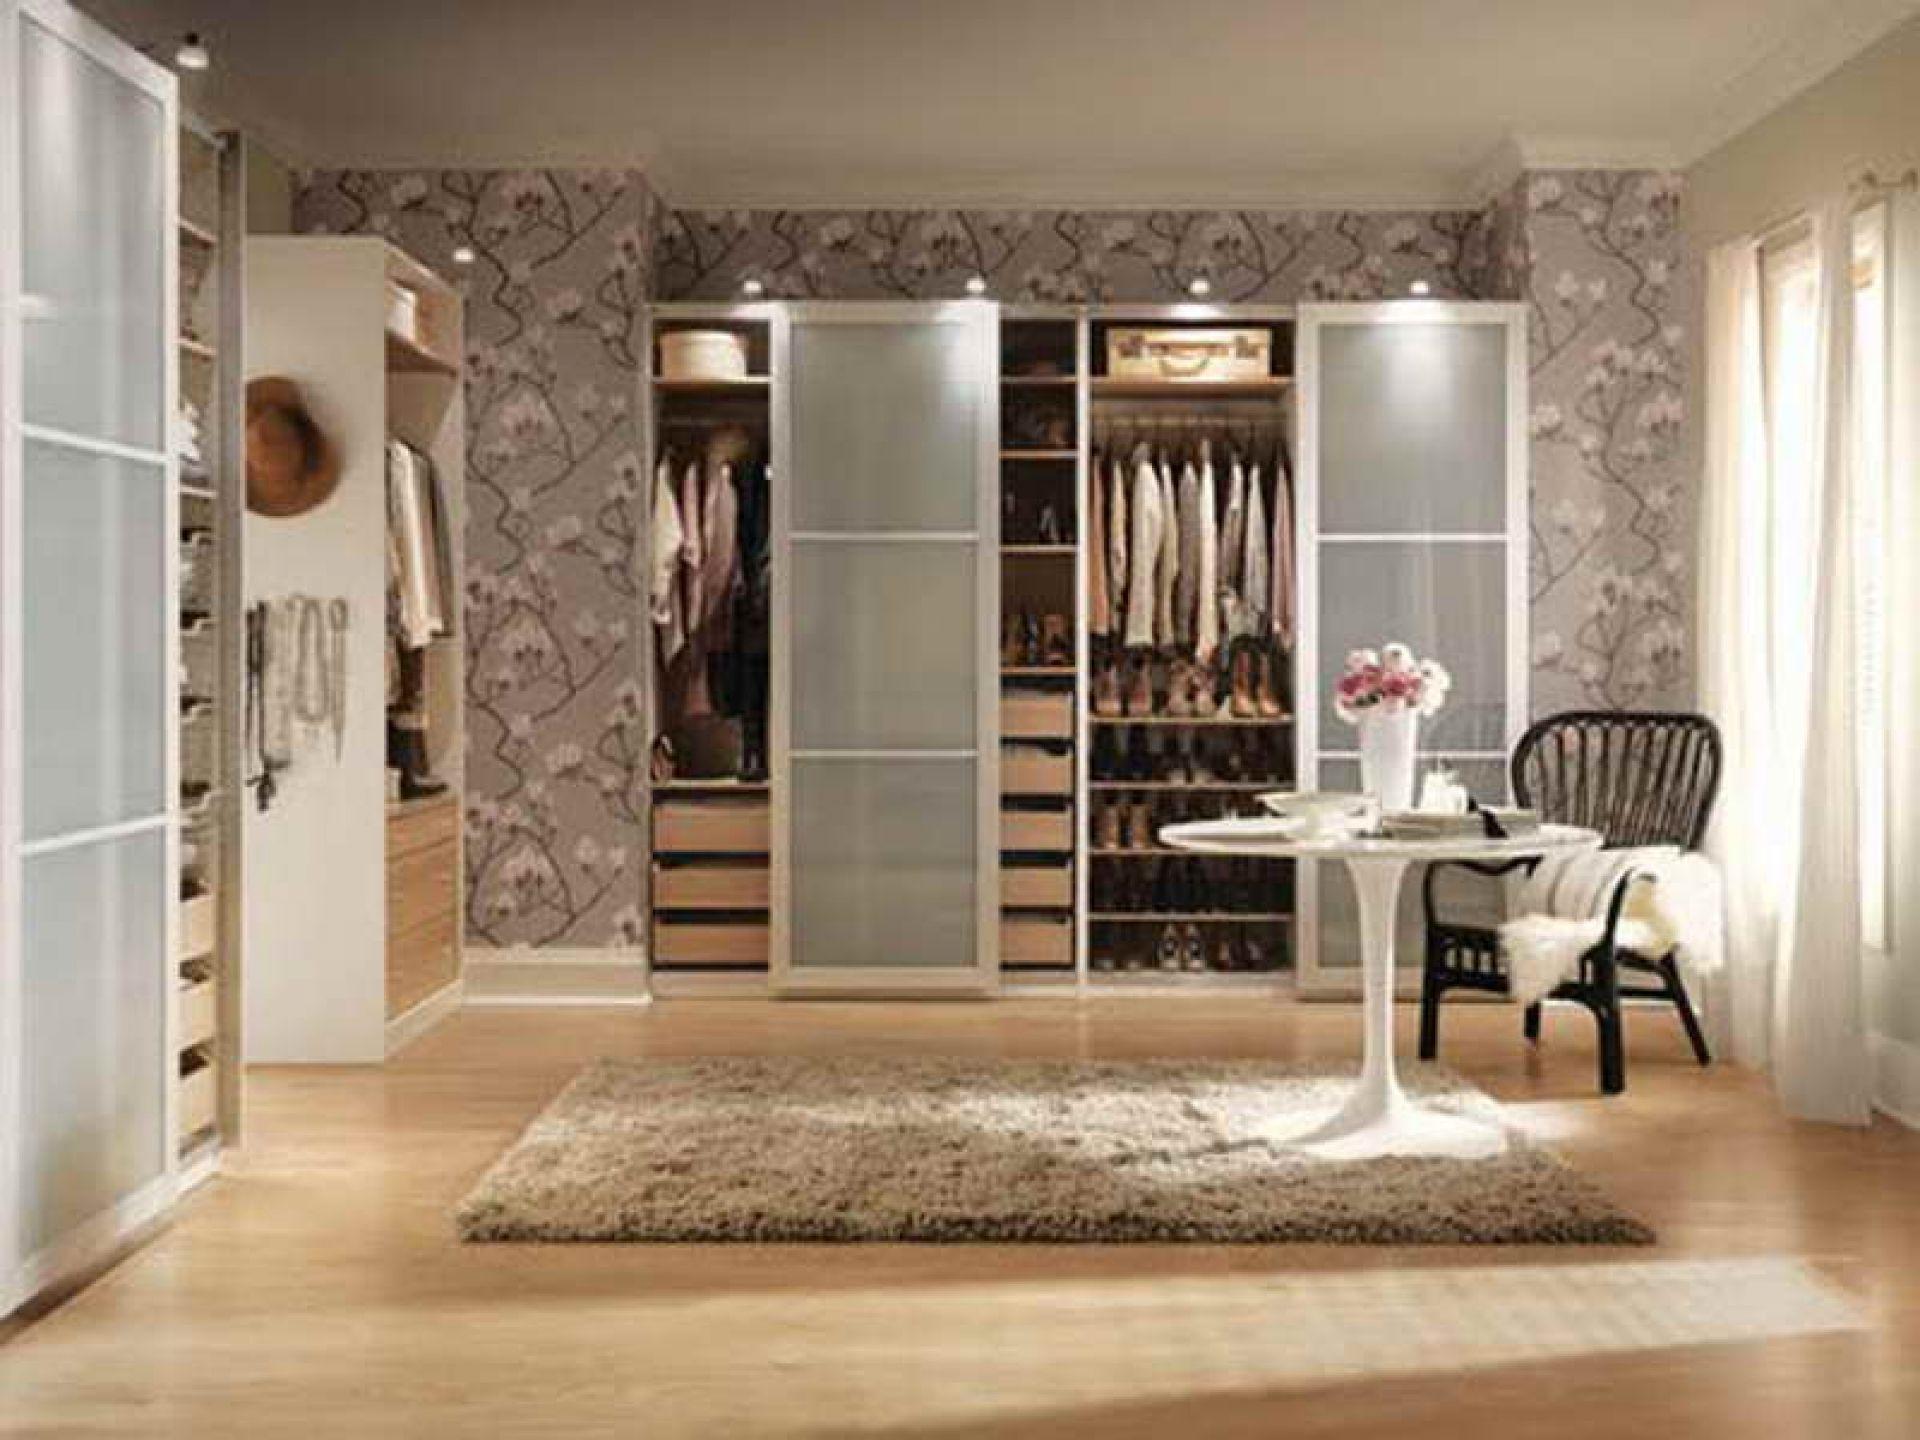 Misure scaffali cabina armadio : 18 closet design with sliding doors decor best.com dreaming of